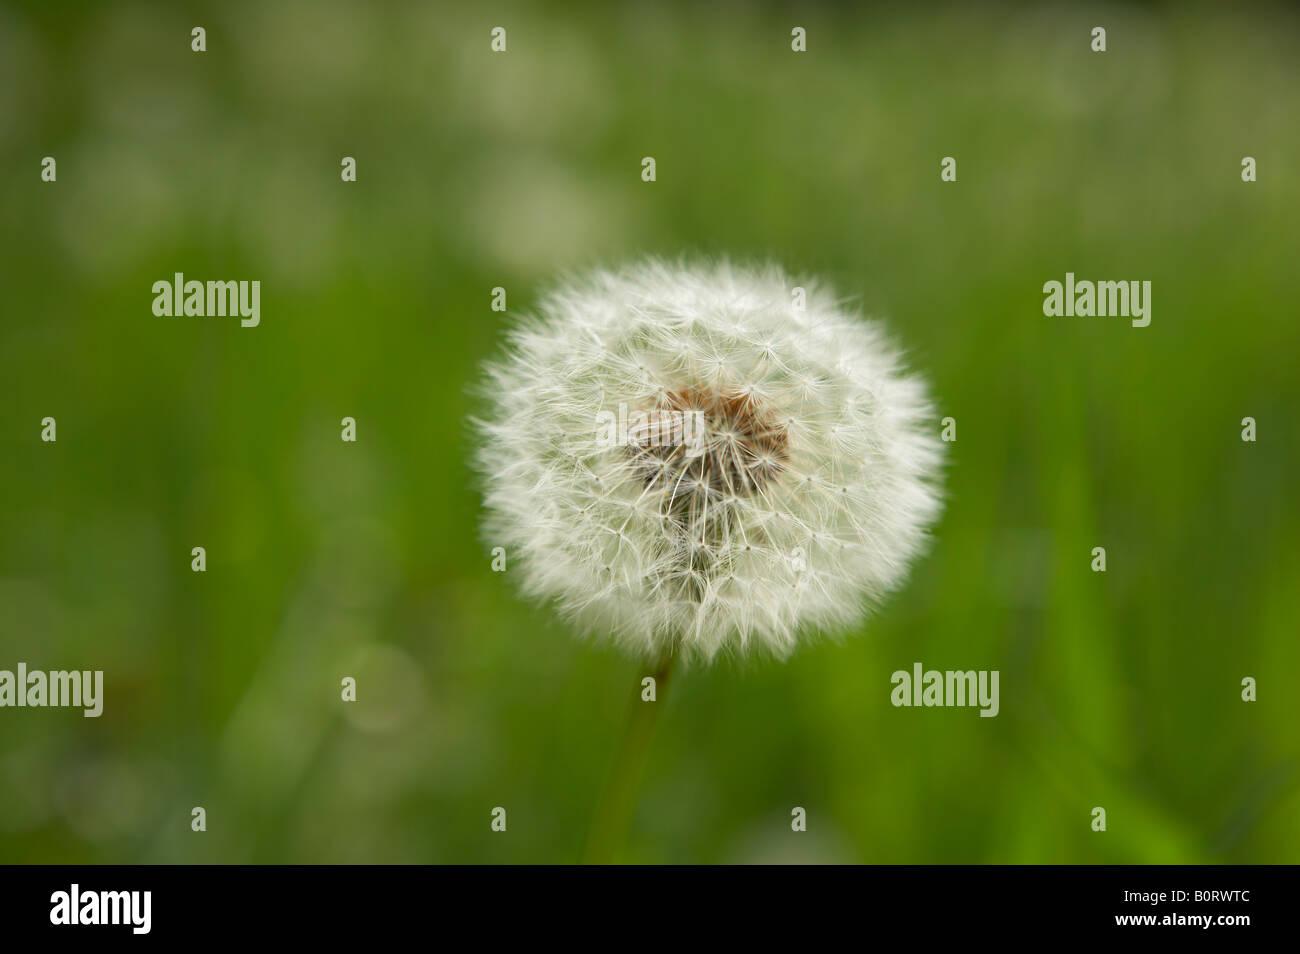 DANDELION CLOCK SEEDS GROWING IN LONG GRASS - Stock Image